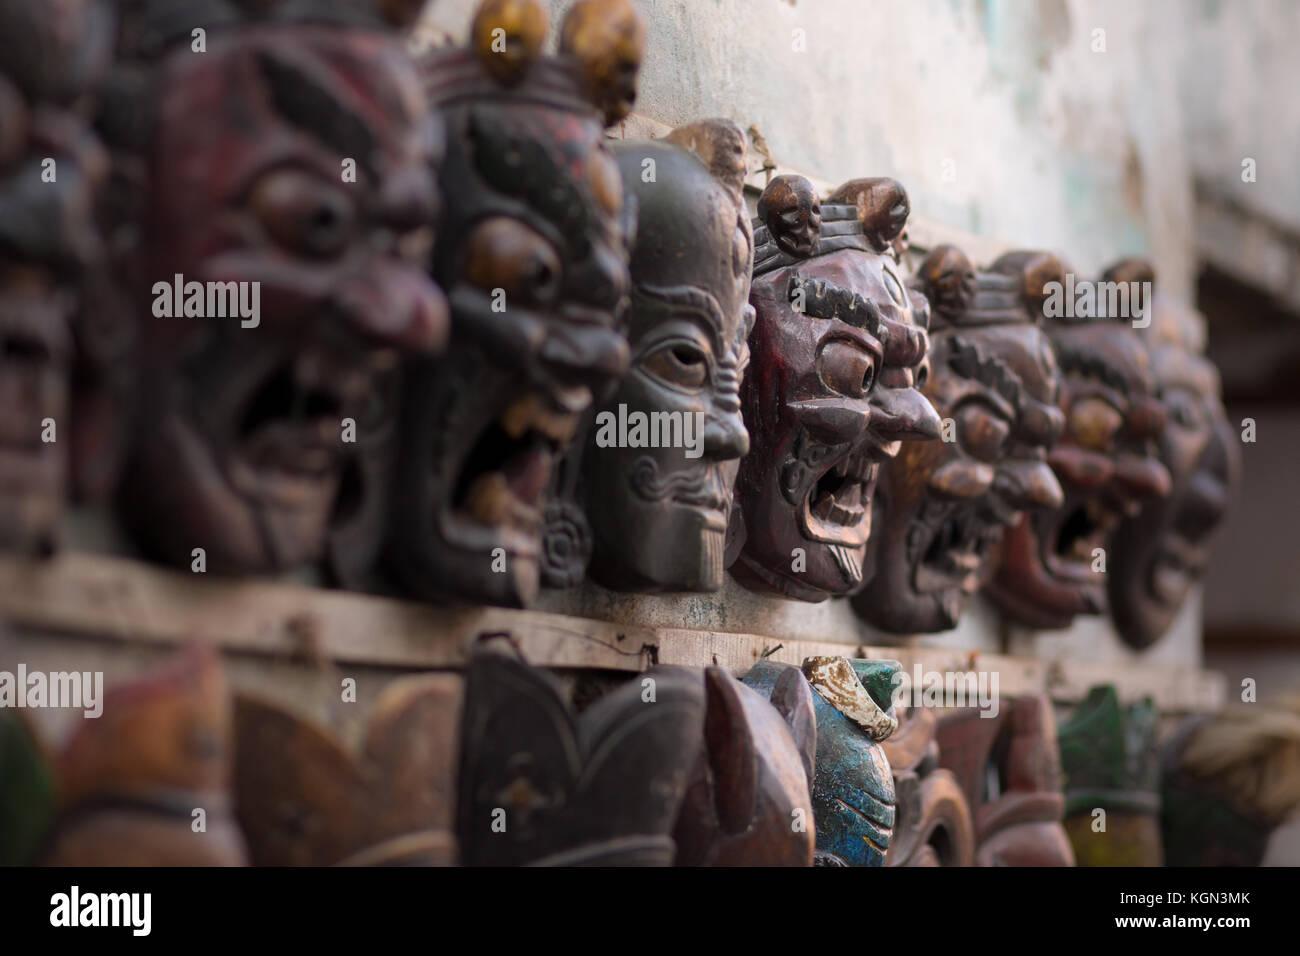 Masks on display along the street in Kathmandu, Nepal - Stock Image